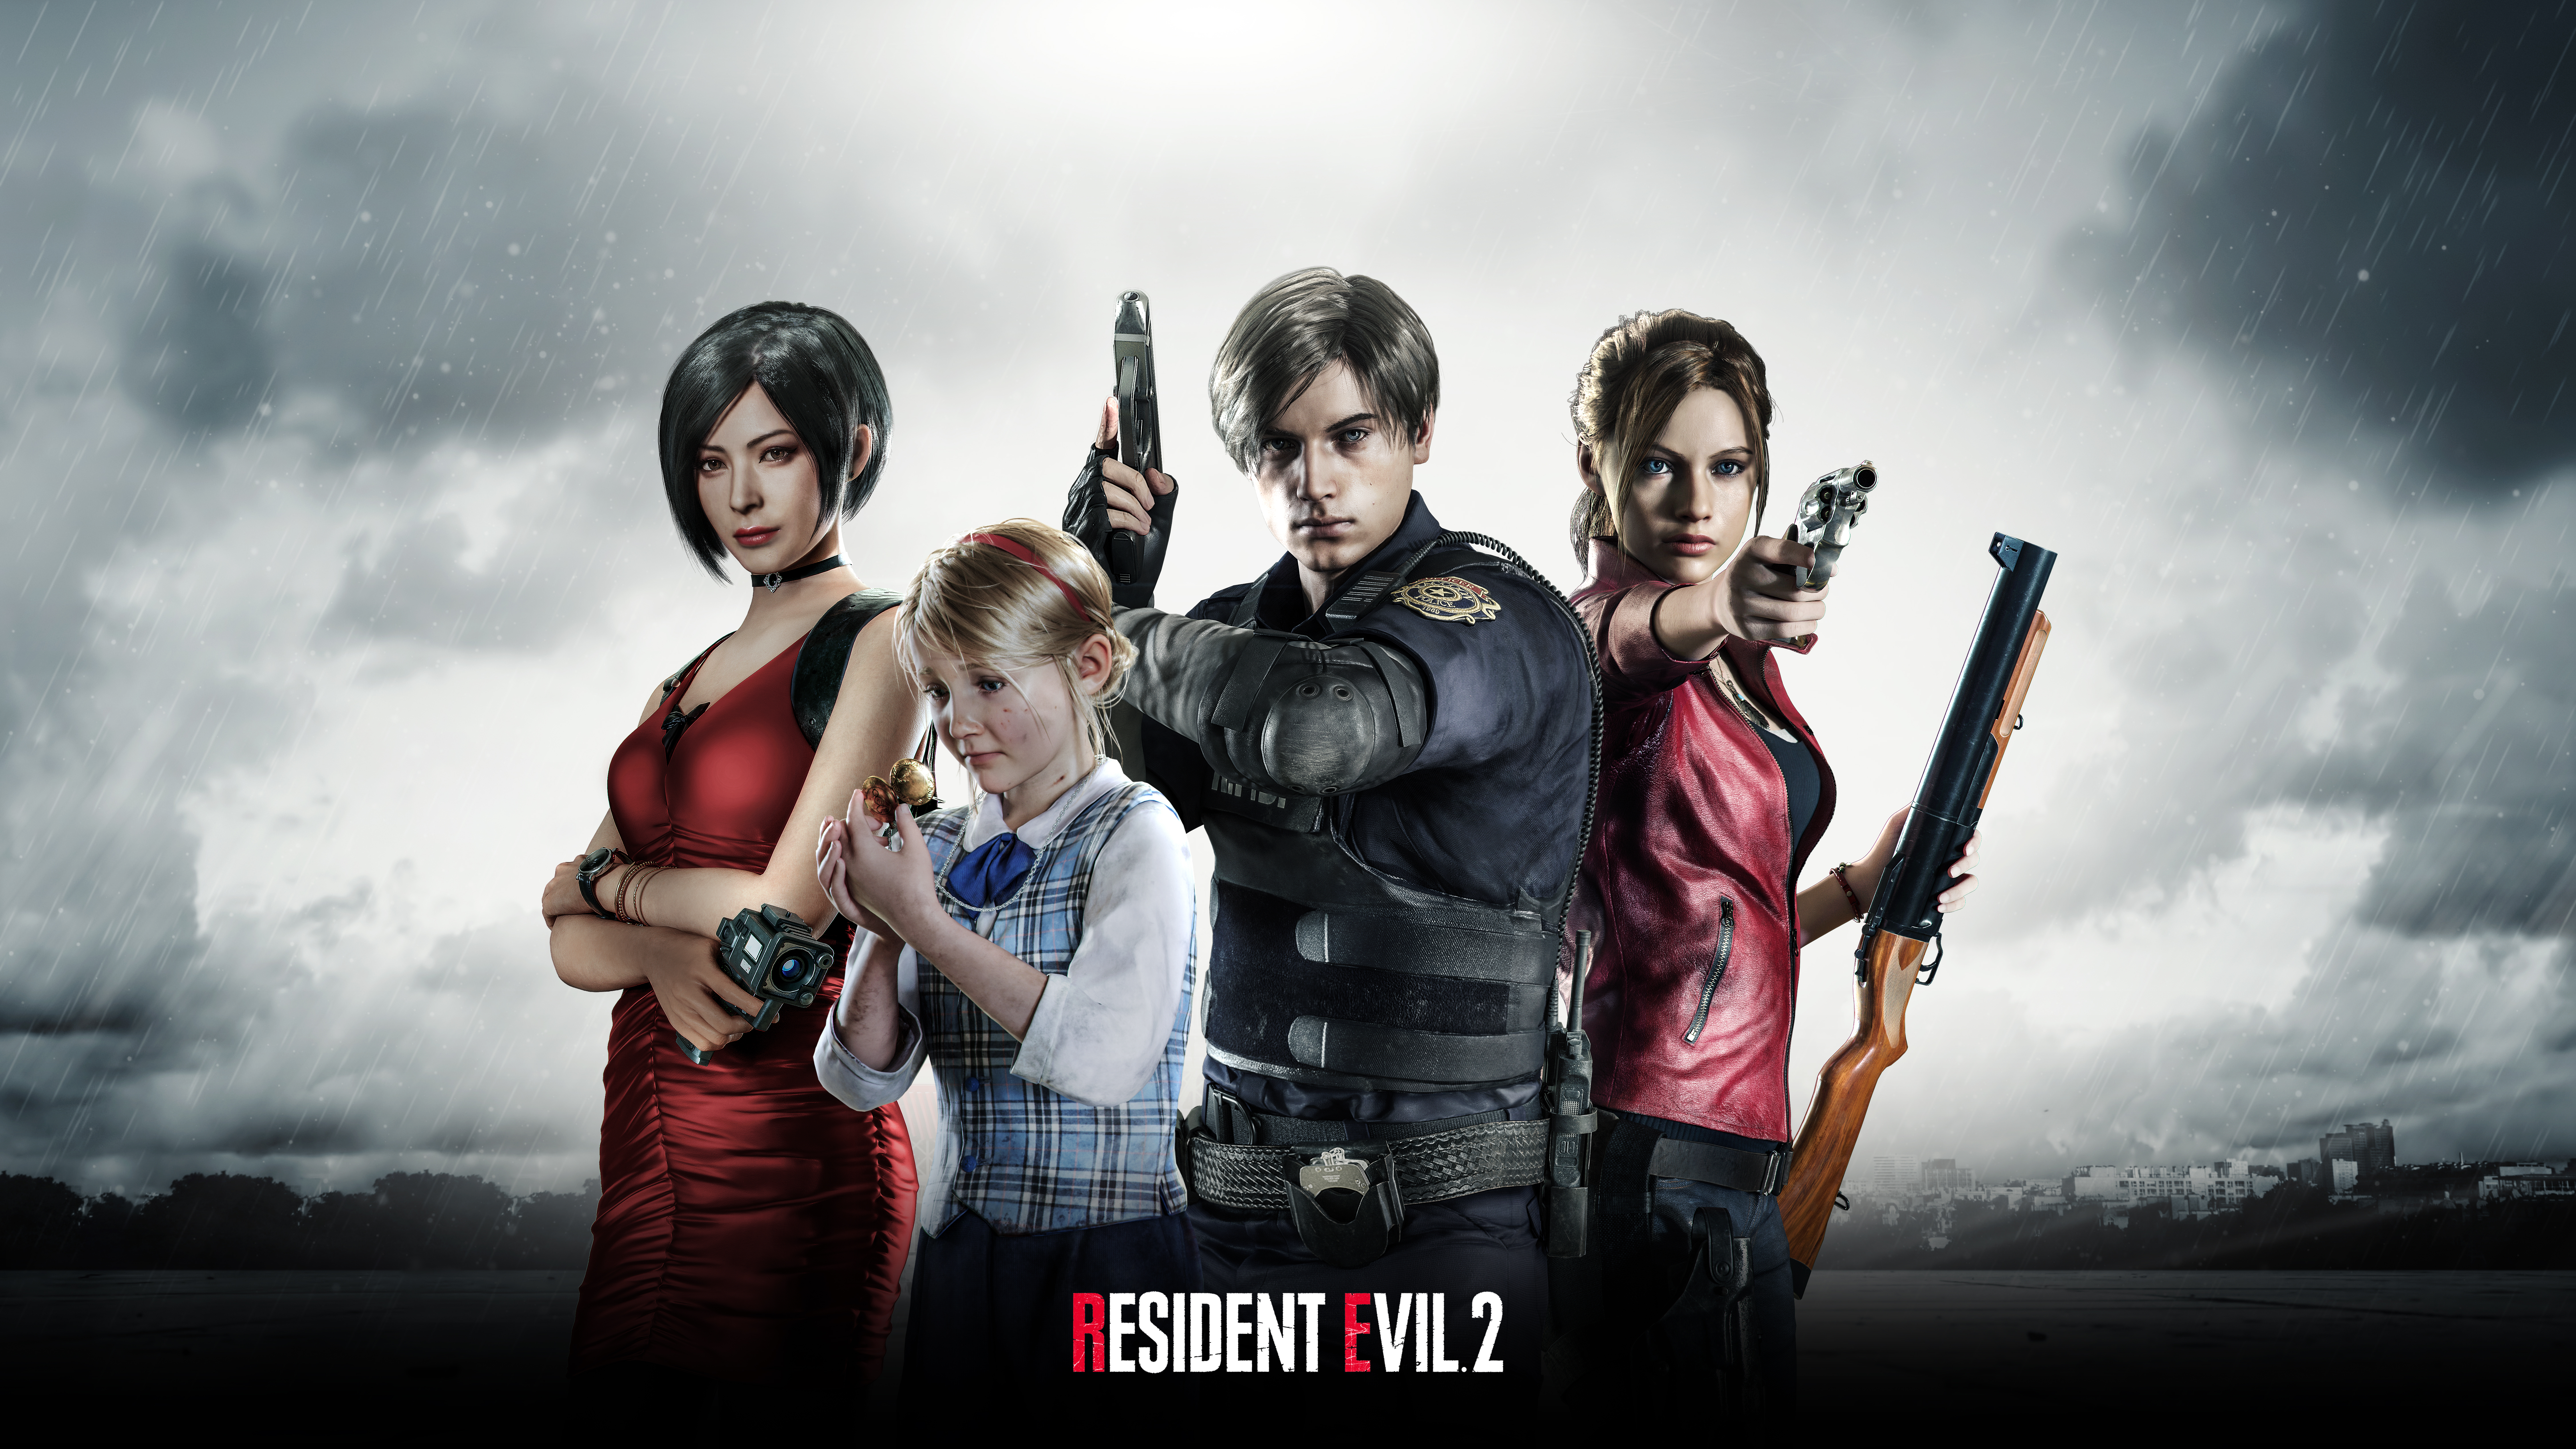 Resident Evil 2 2019 10k Hd Games 4k Wallpapers Images